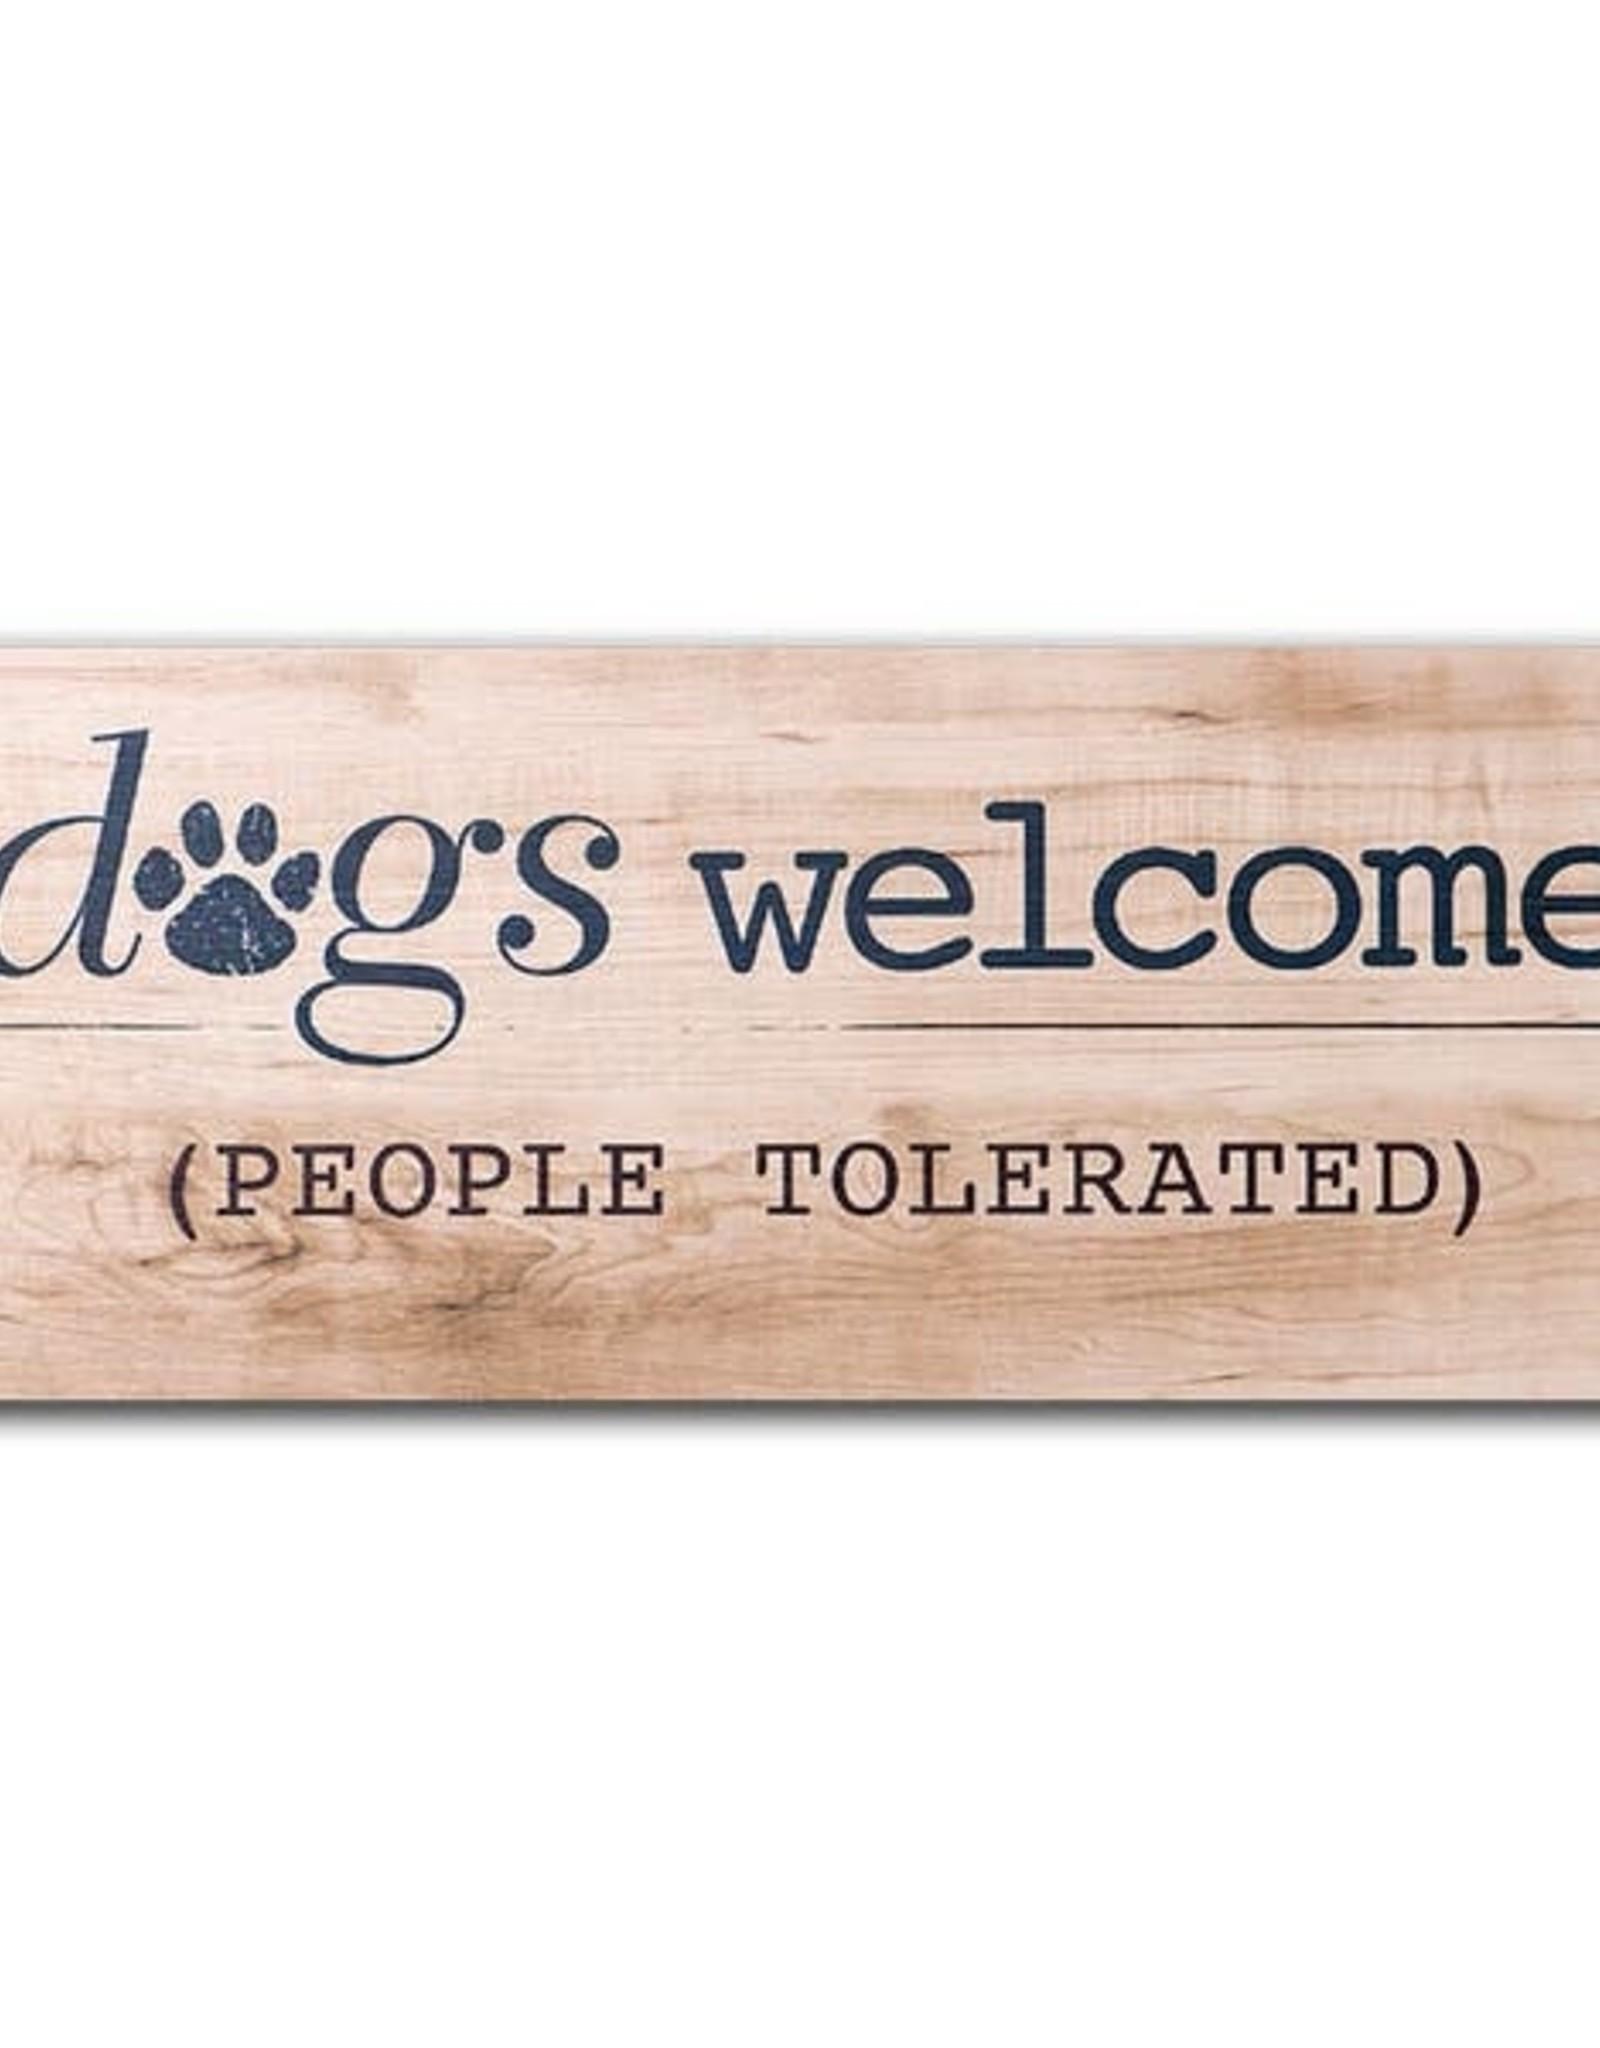 Dog Speak Dog Speak Pallet Sign - Dogs Welcome, People Tolerated